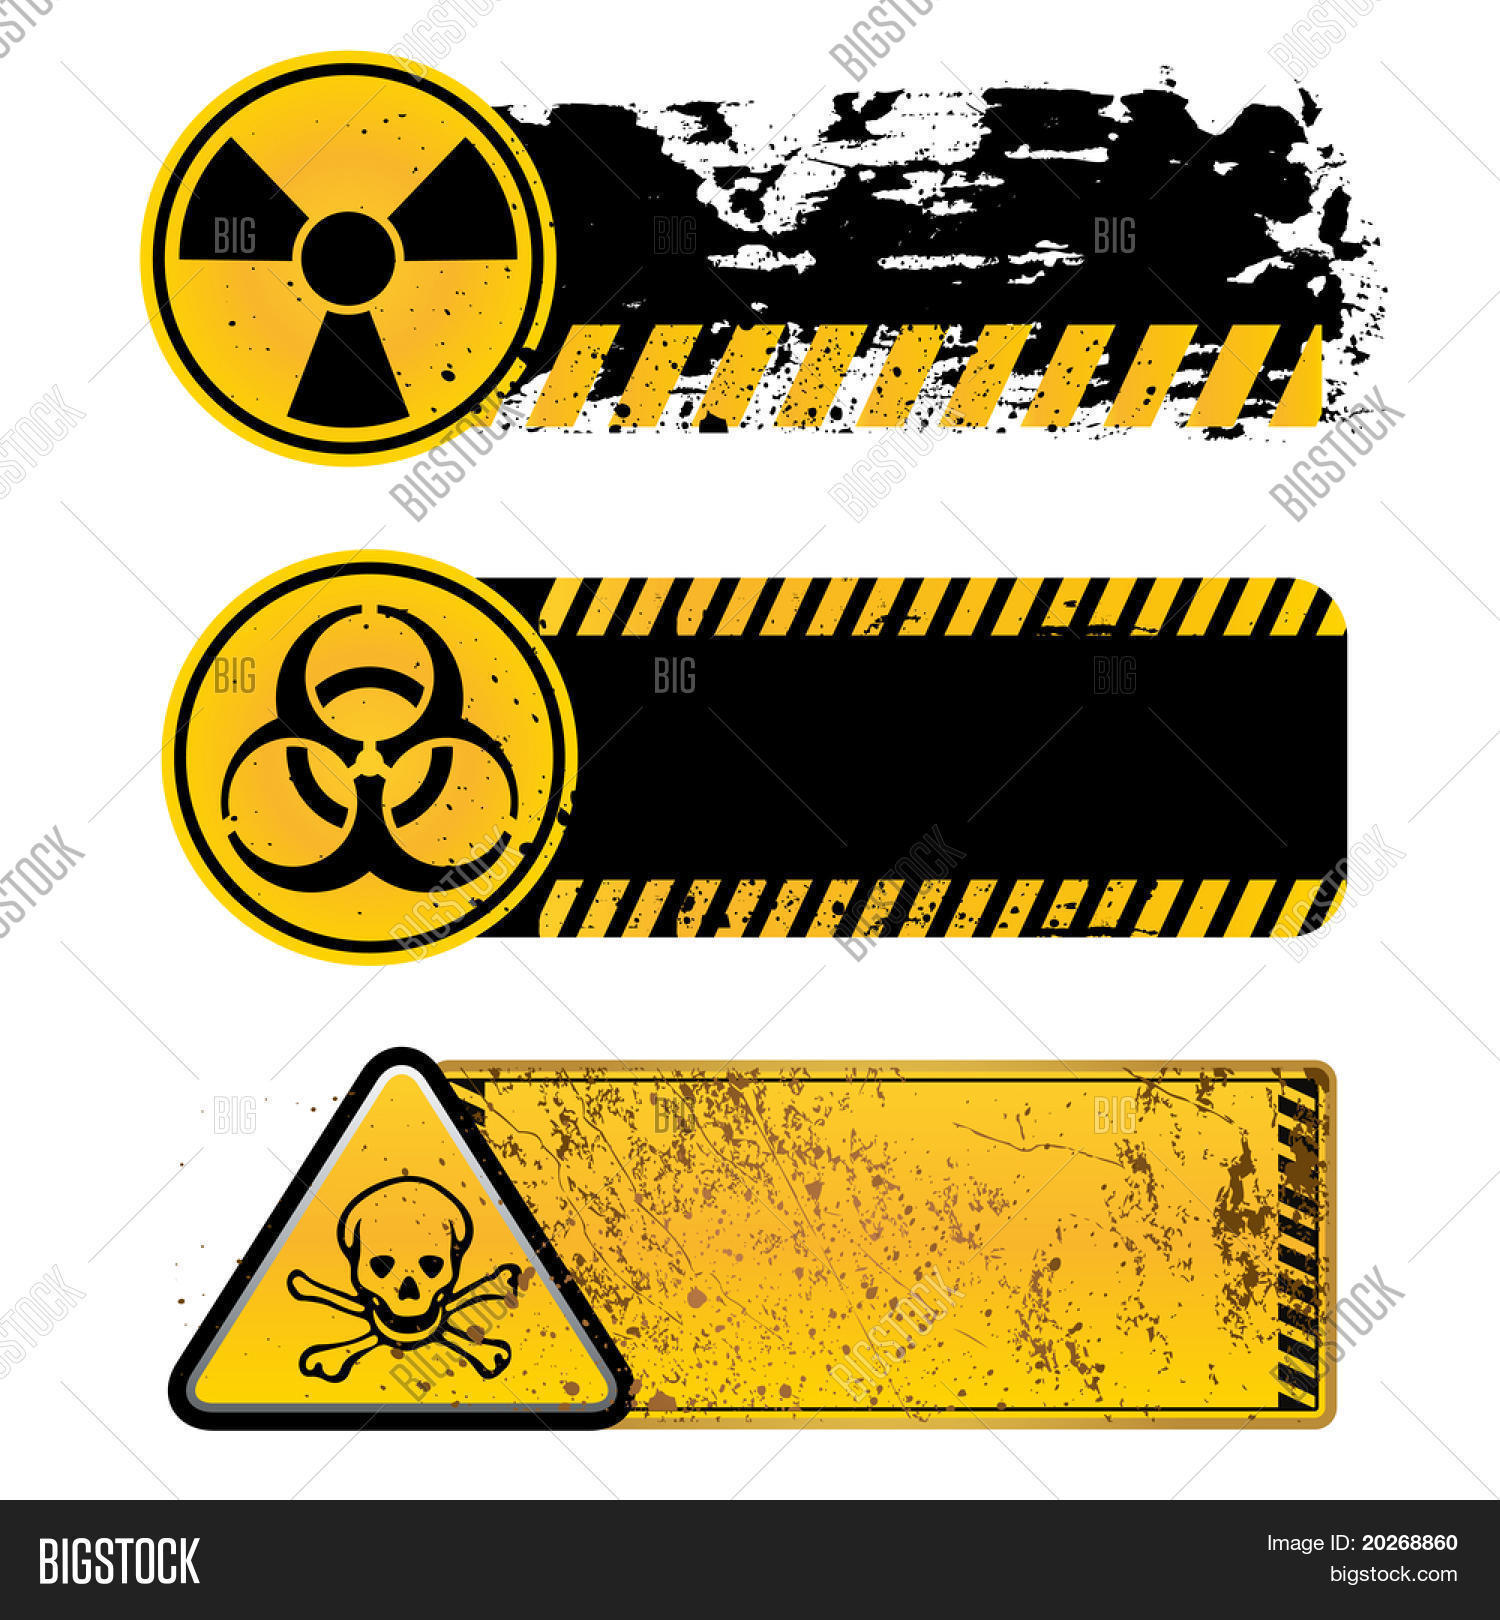 Danger Warning Vector Photo Free Trial Bigstock